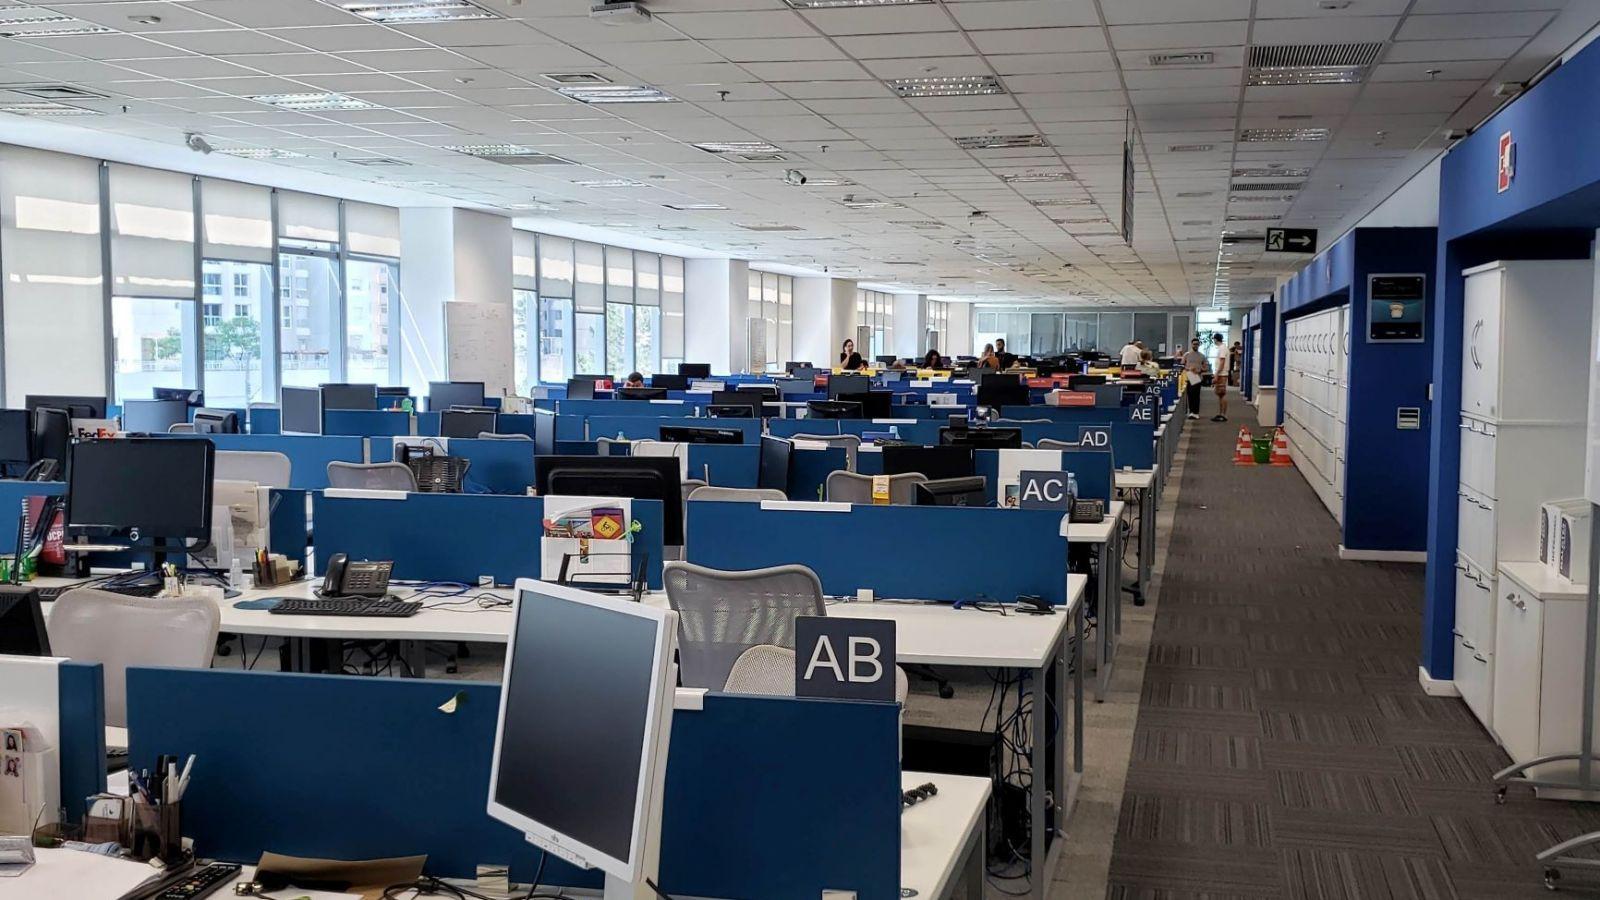 Comprehensive Office Risk Assessment Template